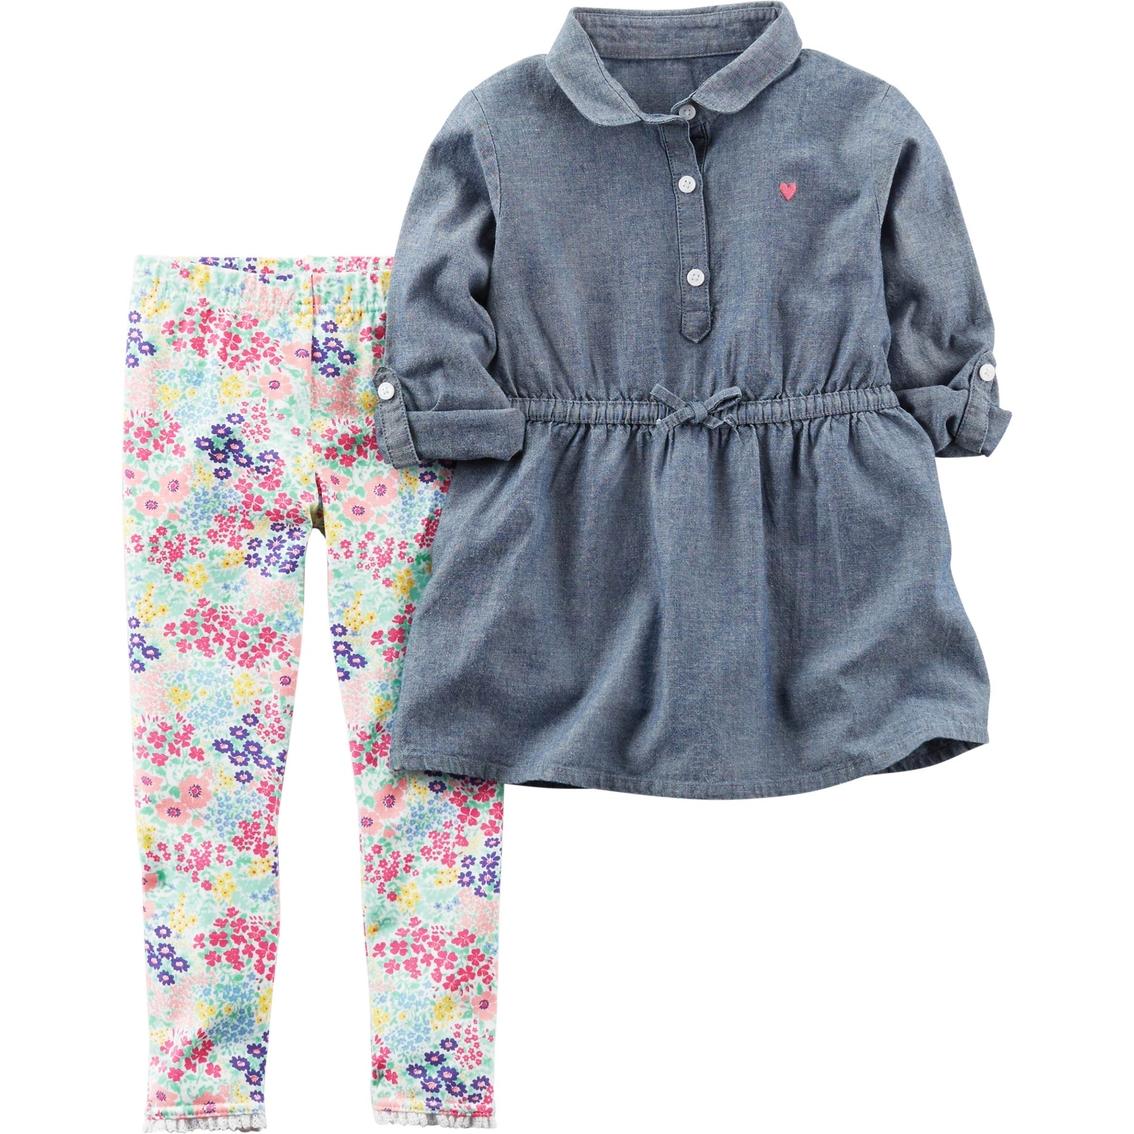 aa96953eccd4 Carter's Toddler Girls Chambray Drop Waist Floral Legging 2 Pc. Set ...